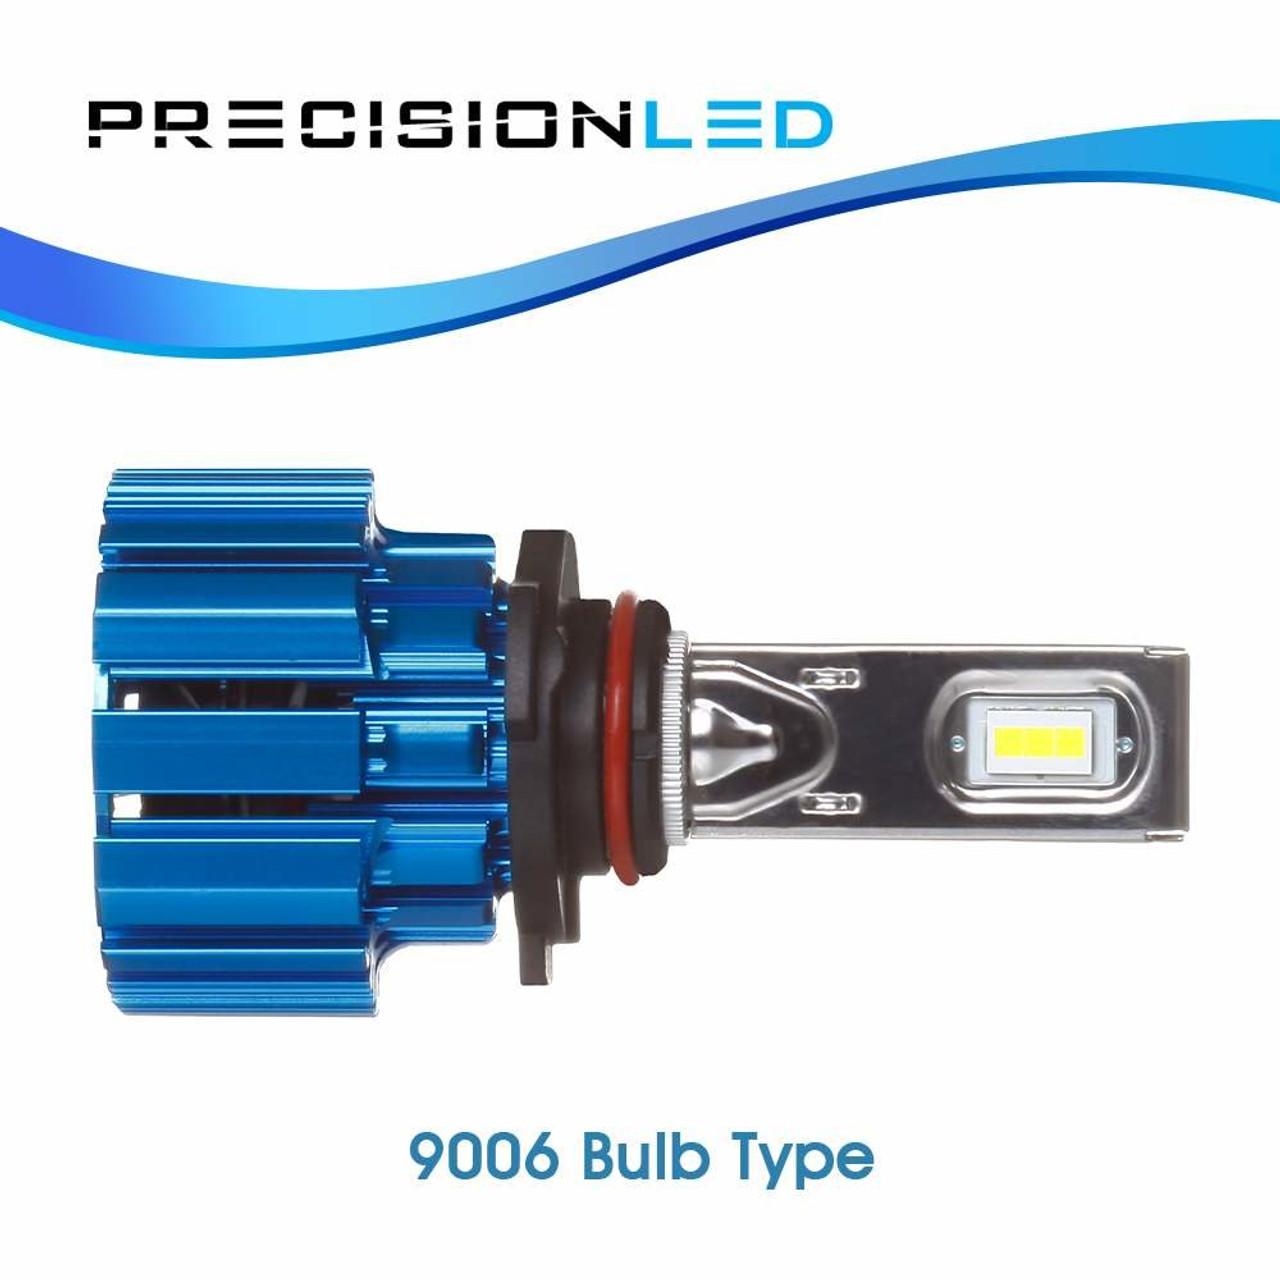 Volvo 960 Premium LED Headlight package (1991 - 1996)